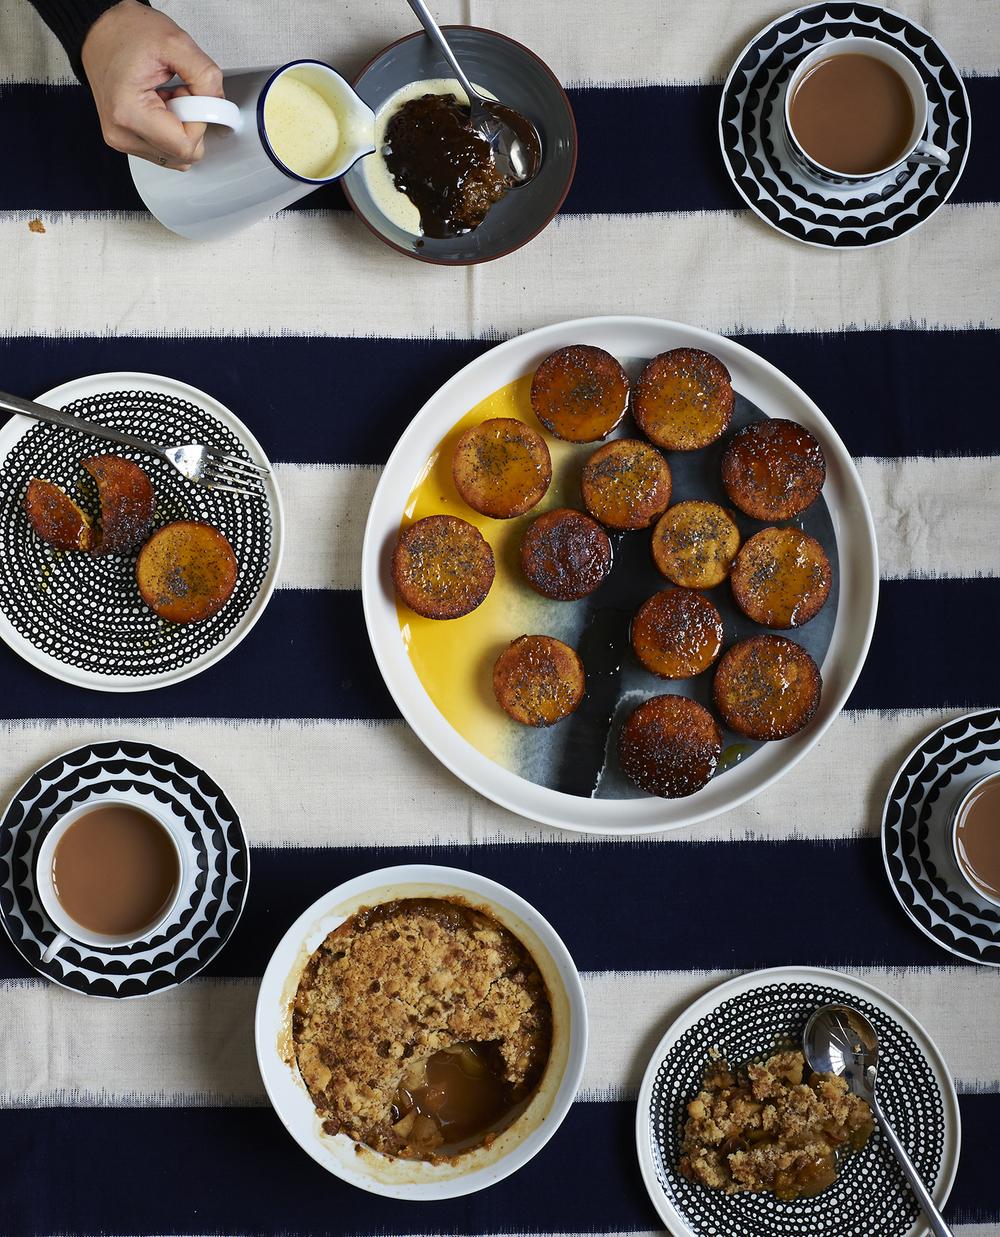 oliver_rowe_guardian_cook_feasting4_henry_14.12.15_web.jpg